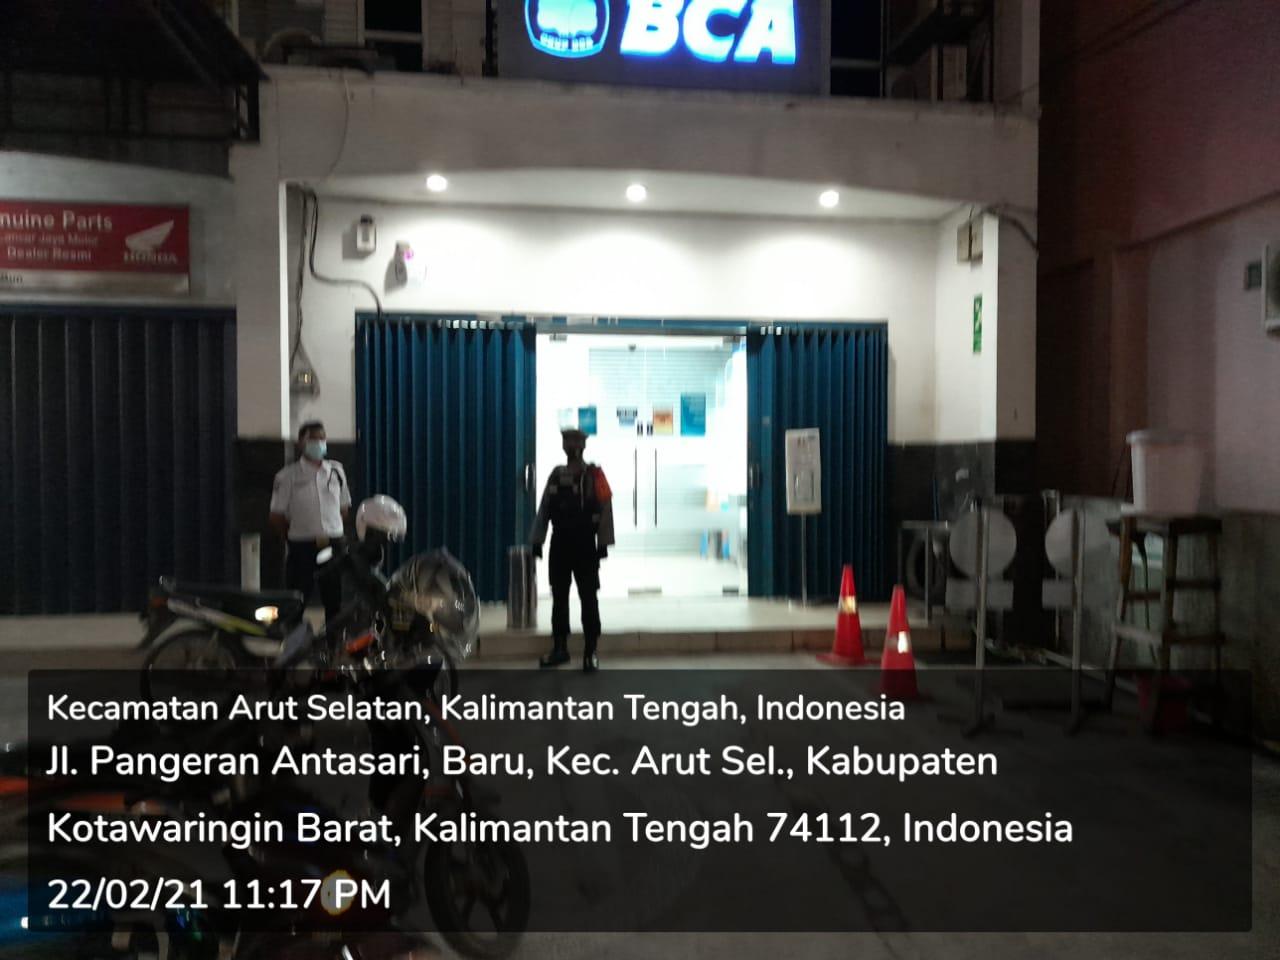 PERSONEL SATSABHARA POLRES KOBAR SAMBANGI BANK BCA DI MALAM HARI 1